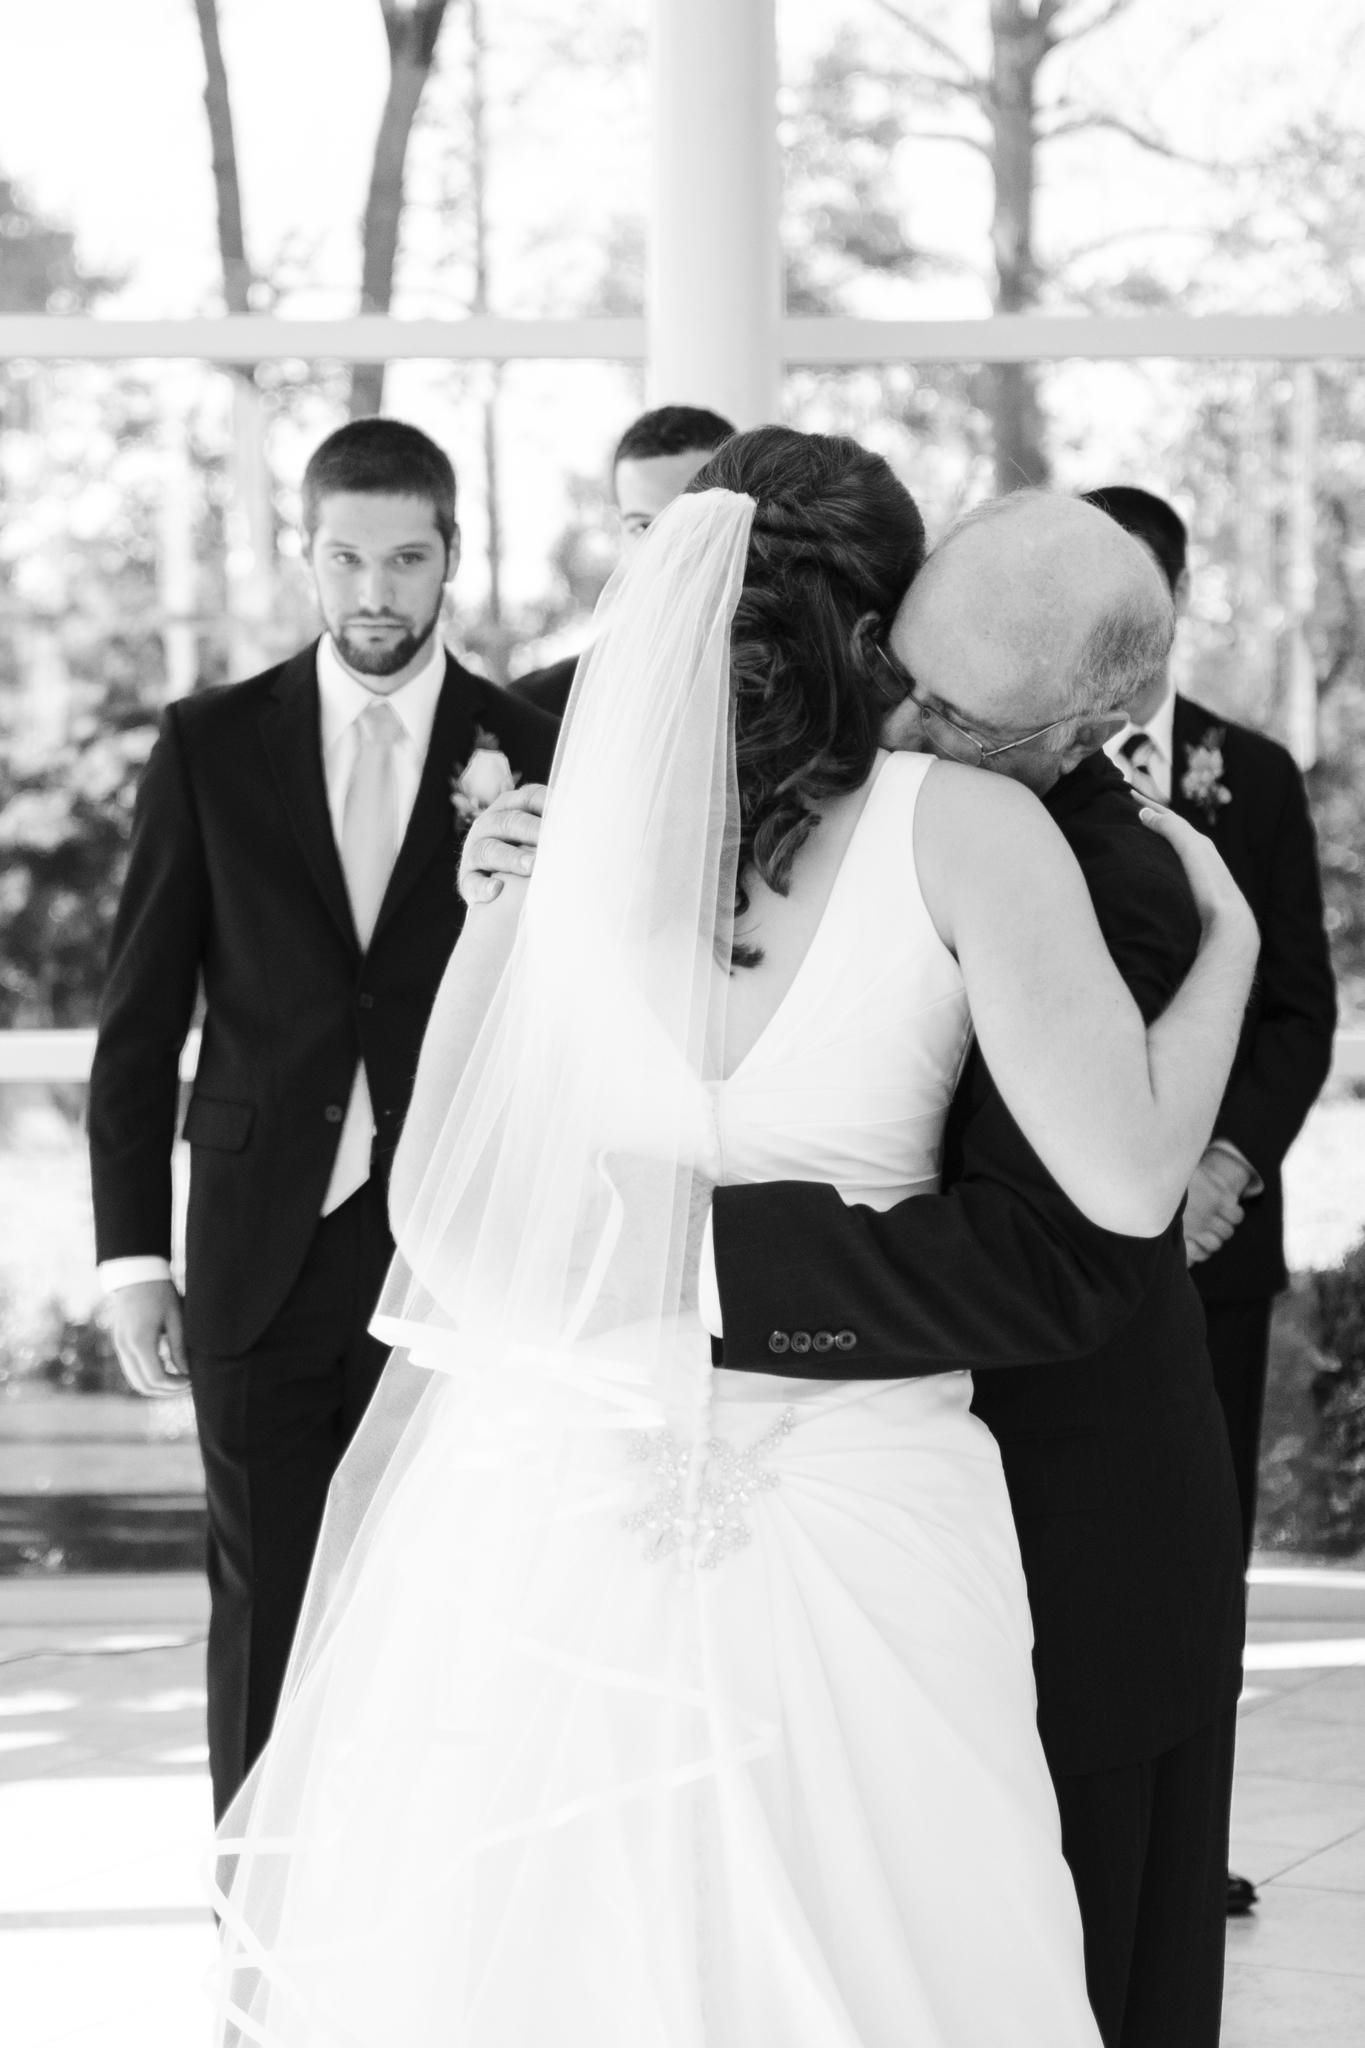 Newton White Mansion wedding photographer in Baltimore, Maryland